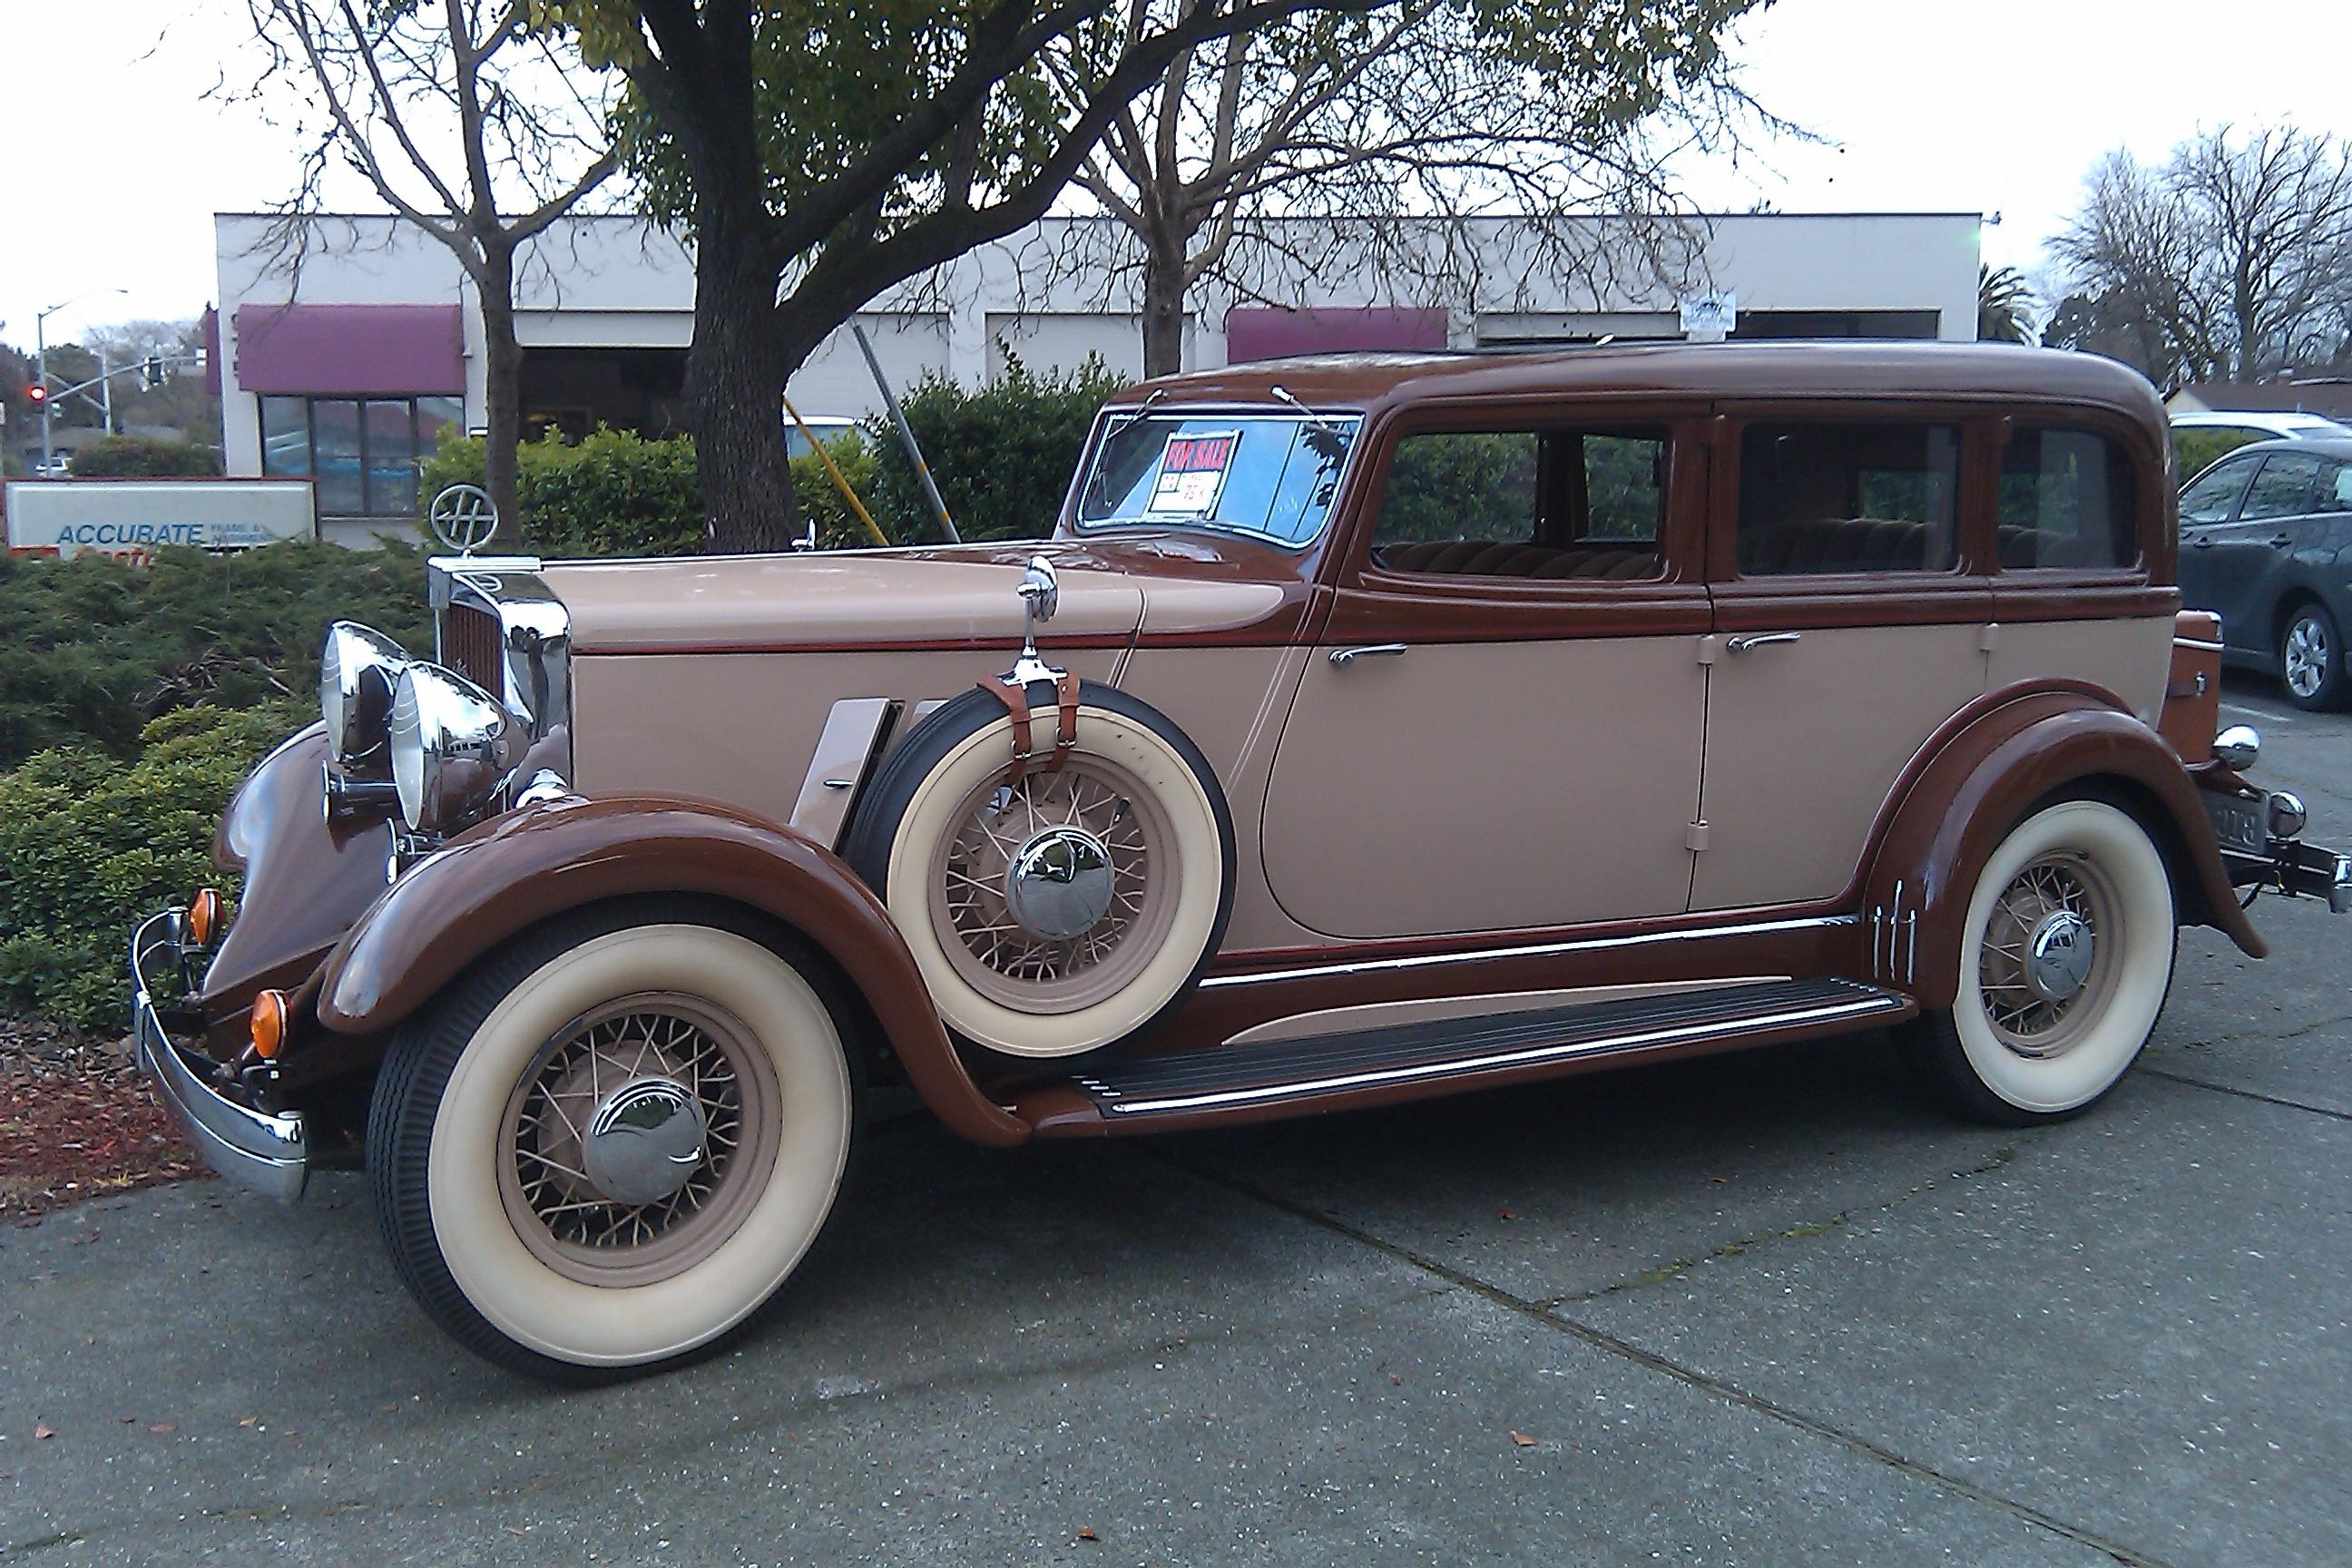 File:1932 Hupmobile (5492799095).jpg - Wikimedia Commons